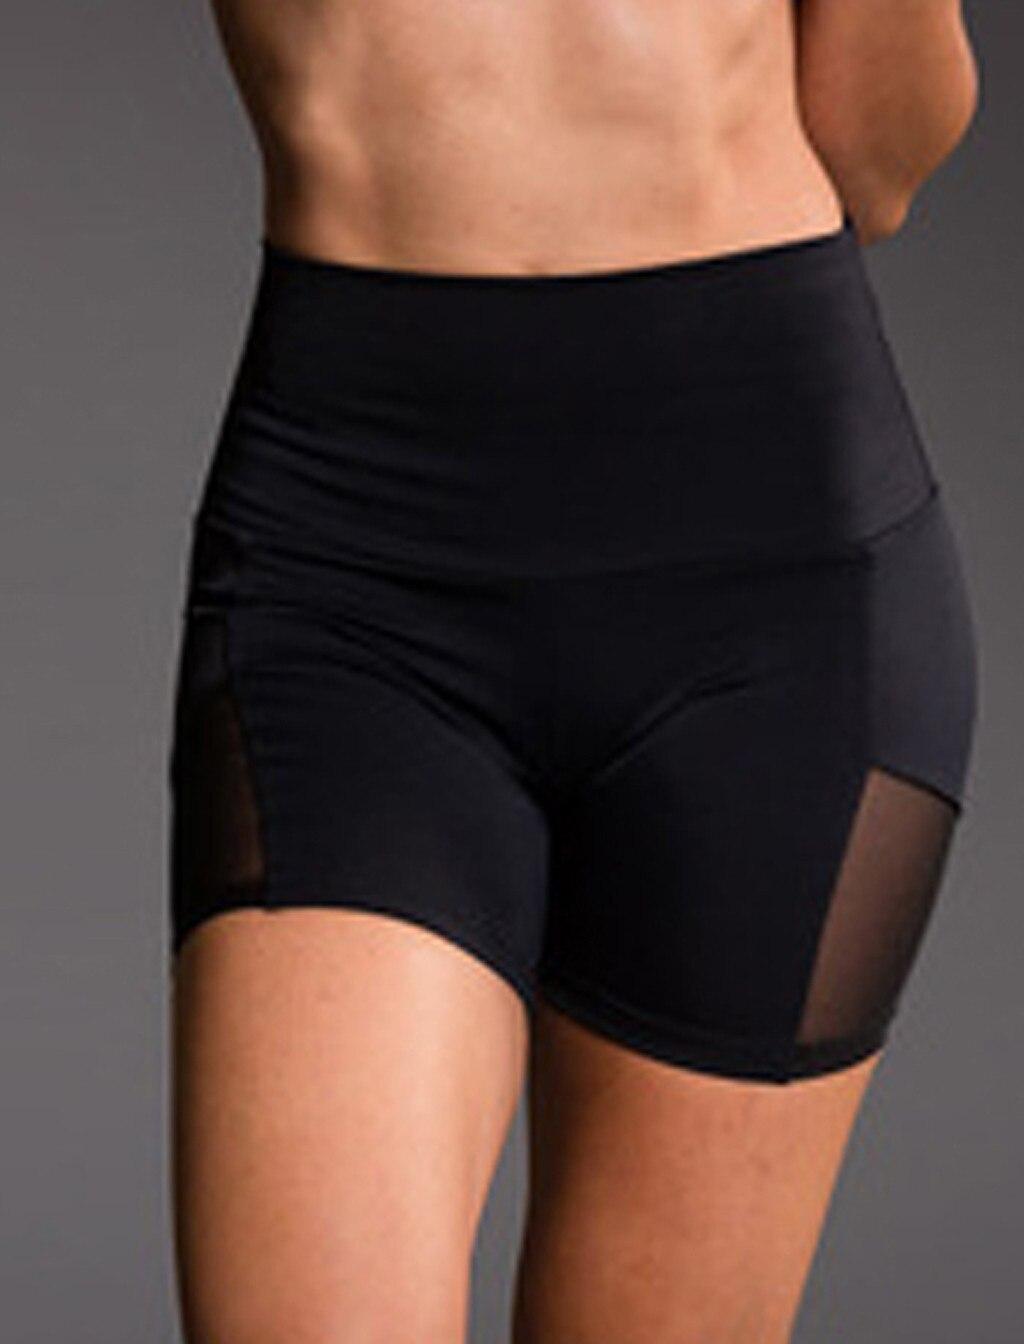 Sports Healty Ladies Yoga Shorts High Waist Sexy Women Skinny Running Sportswear Black Mesh Splice Hot Sale 2020 Summer